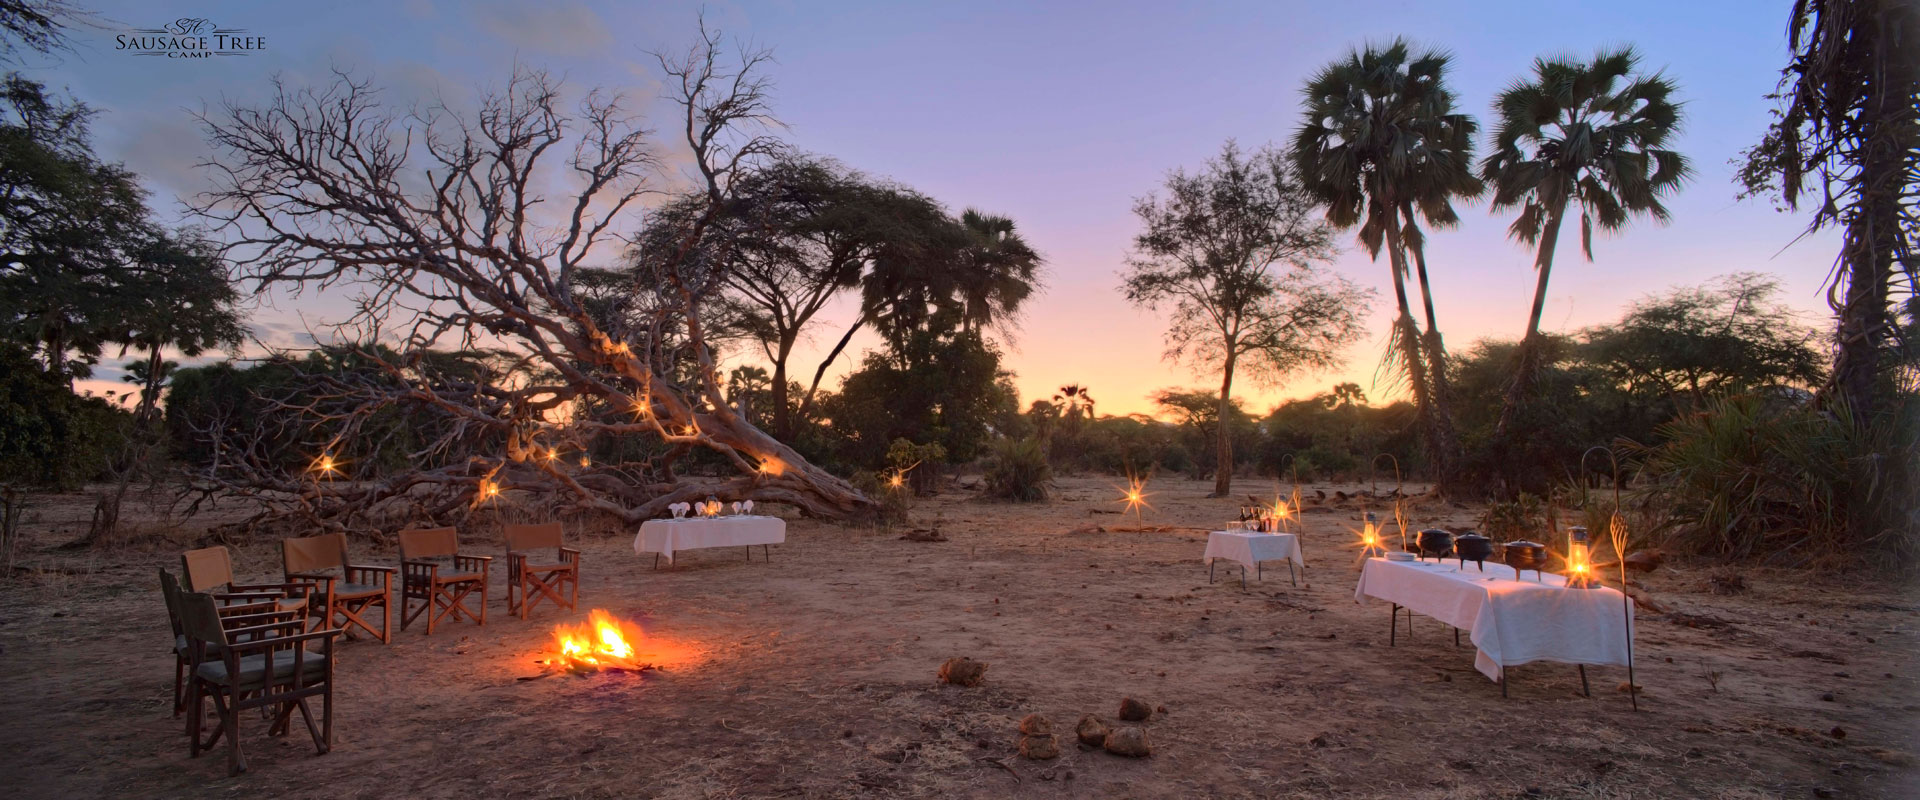 Sausage Tree Camp The Luxury Safari